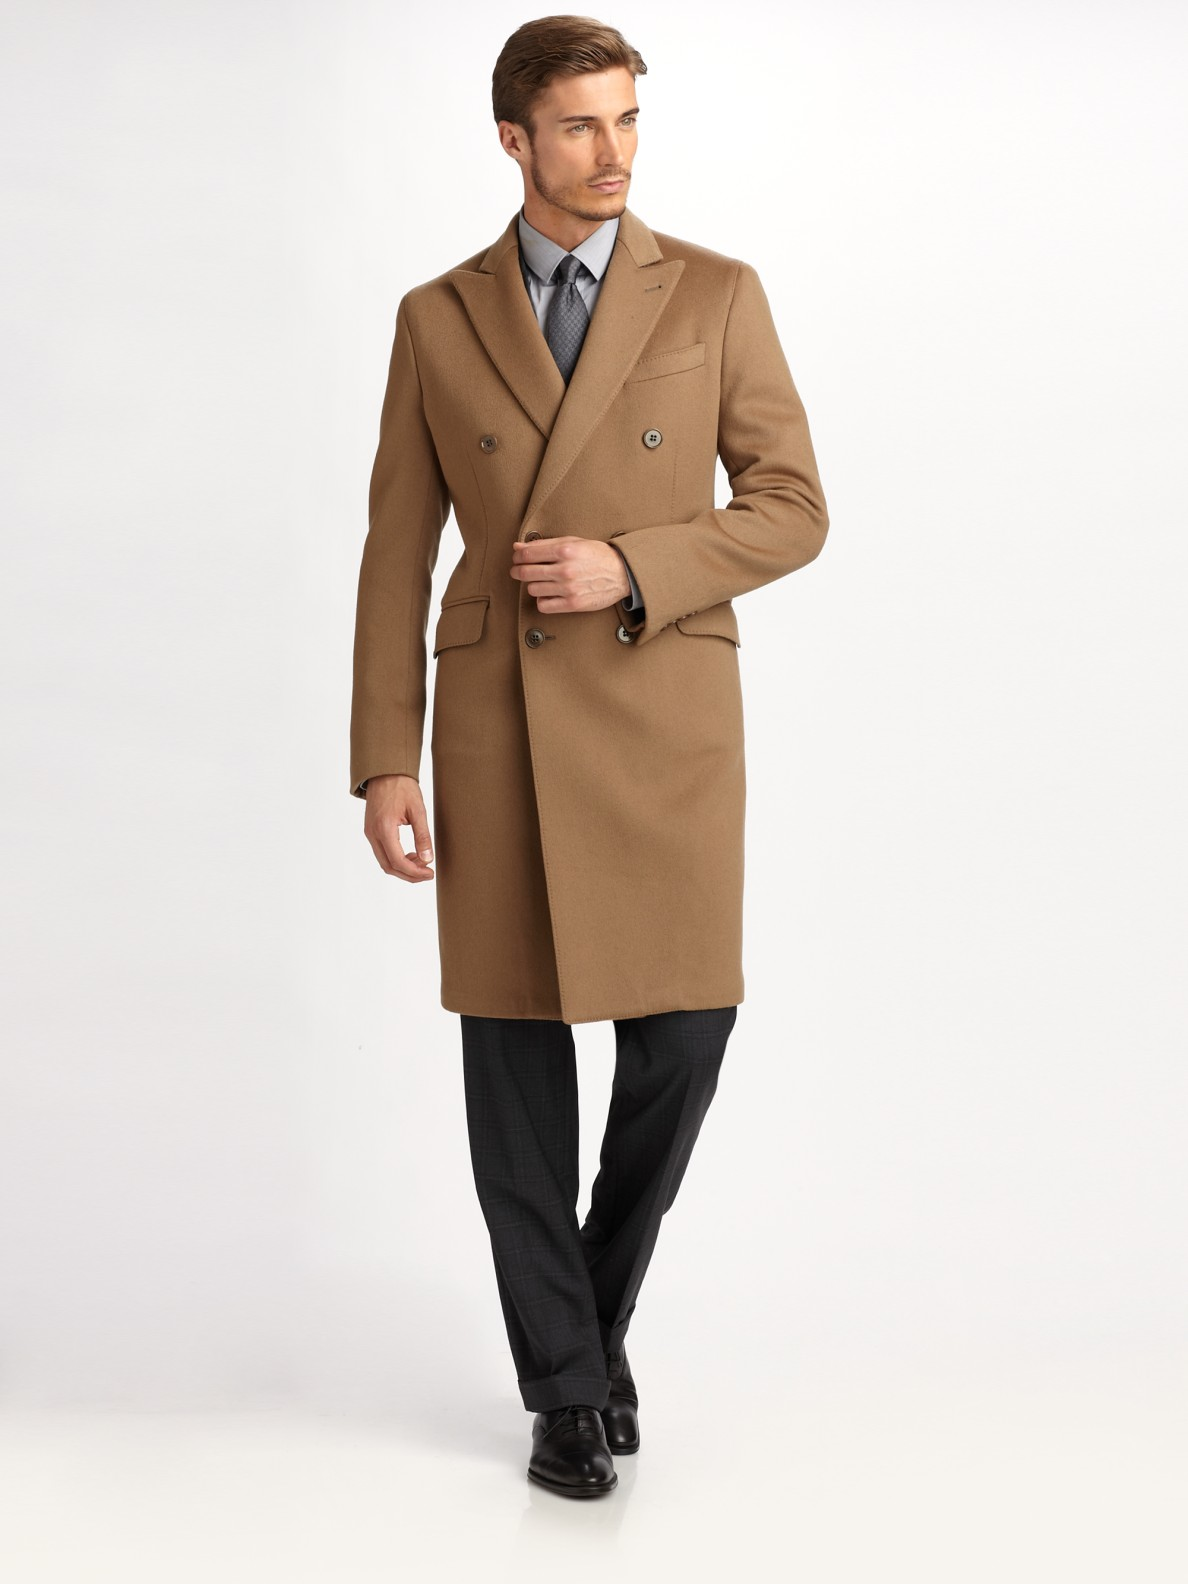 elegant and graceful provide plenty of popular brand Armani Natural Wool / Cashmere Topcoat for men